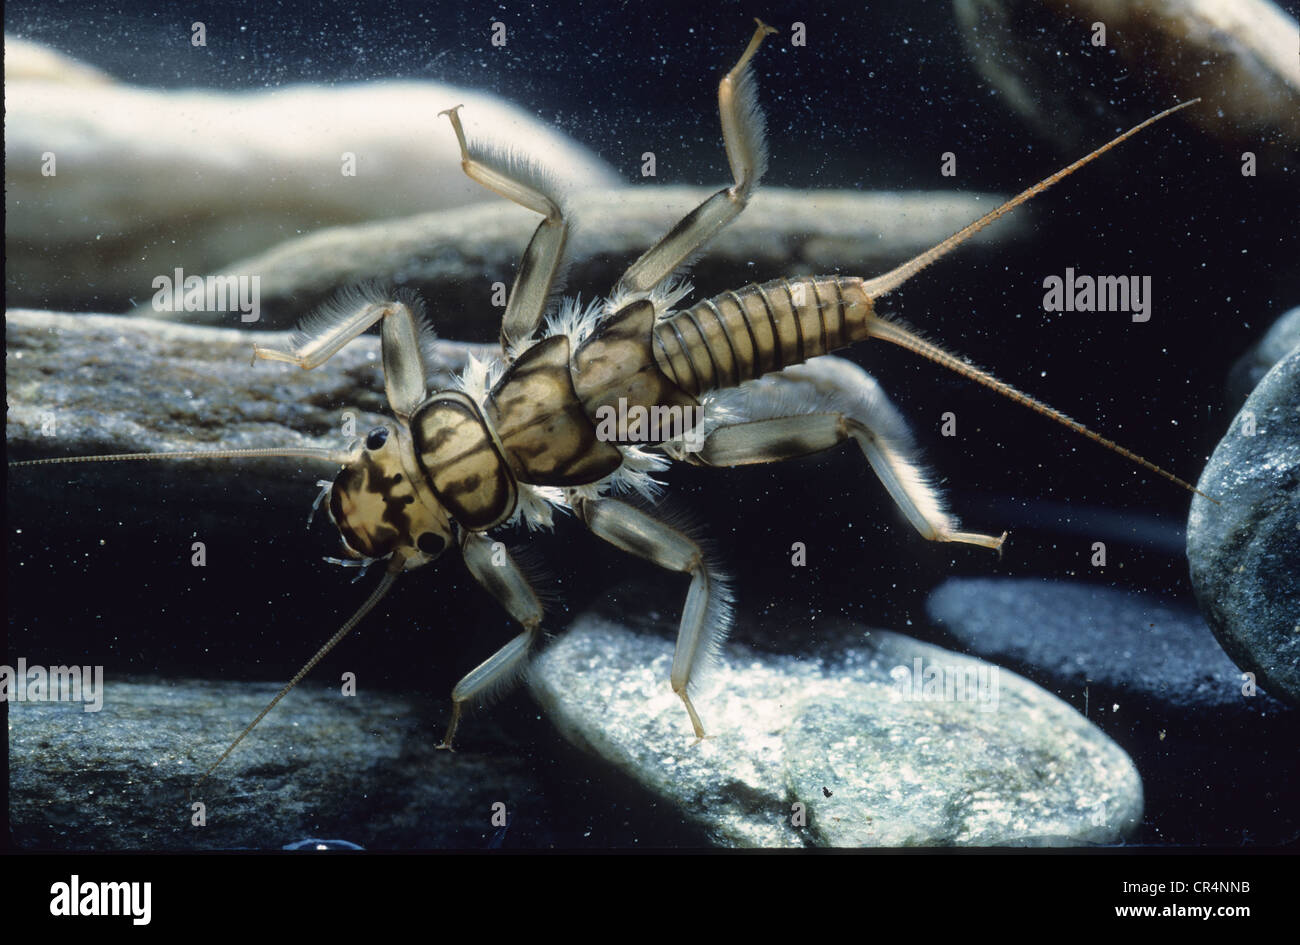 Larva of Stonefly, Plecoptera (Dinocras sp.) - Stock Image